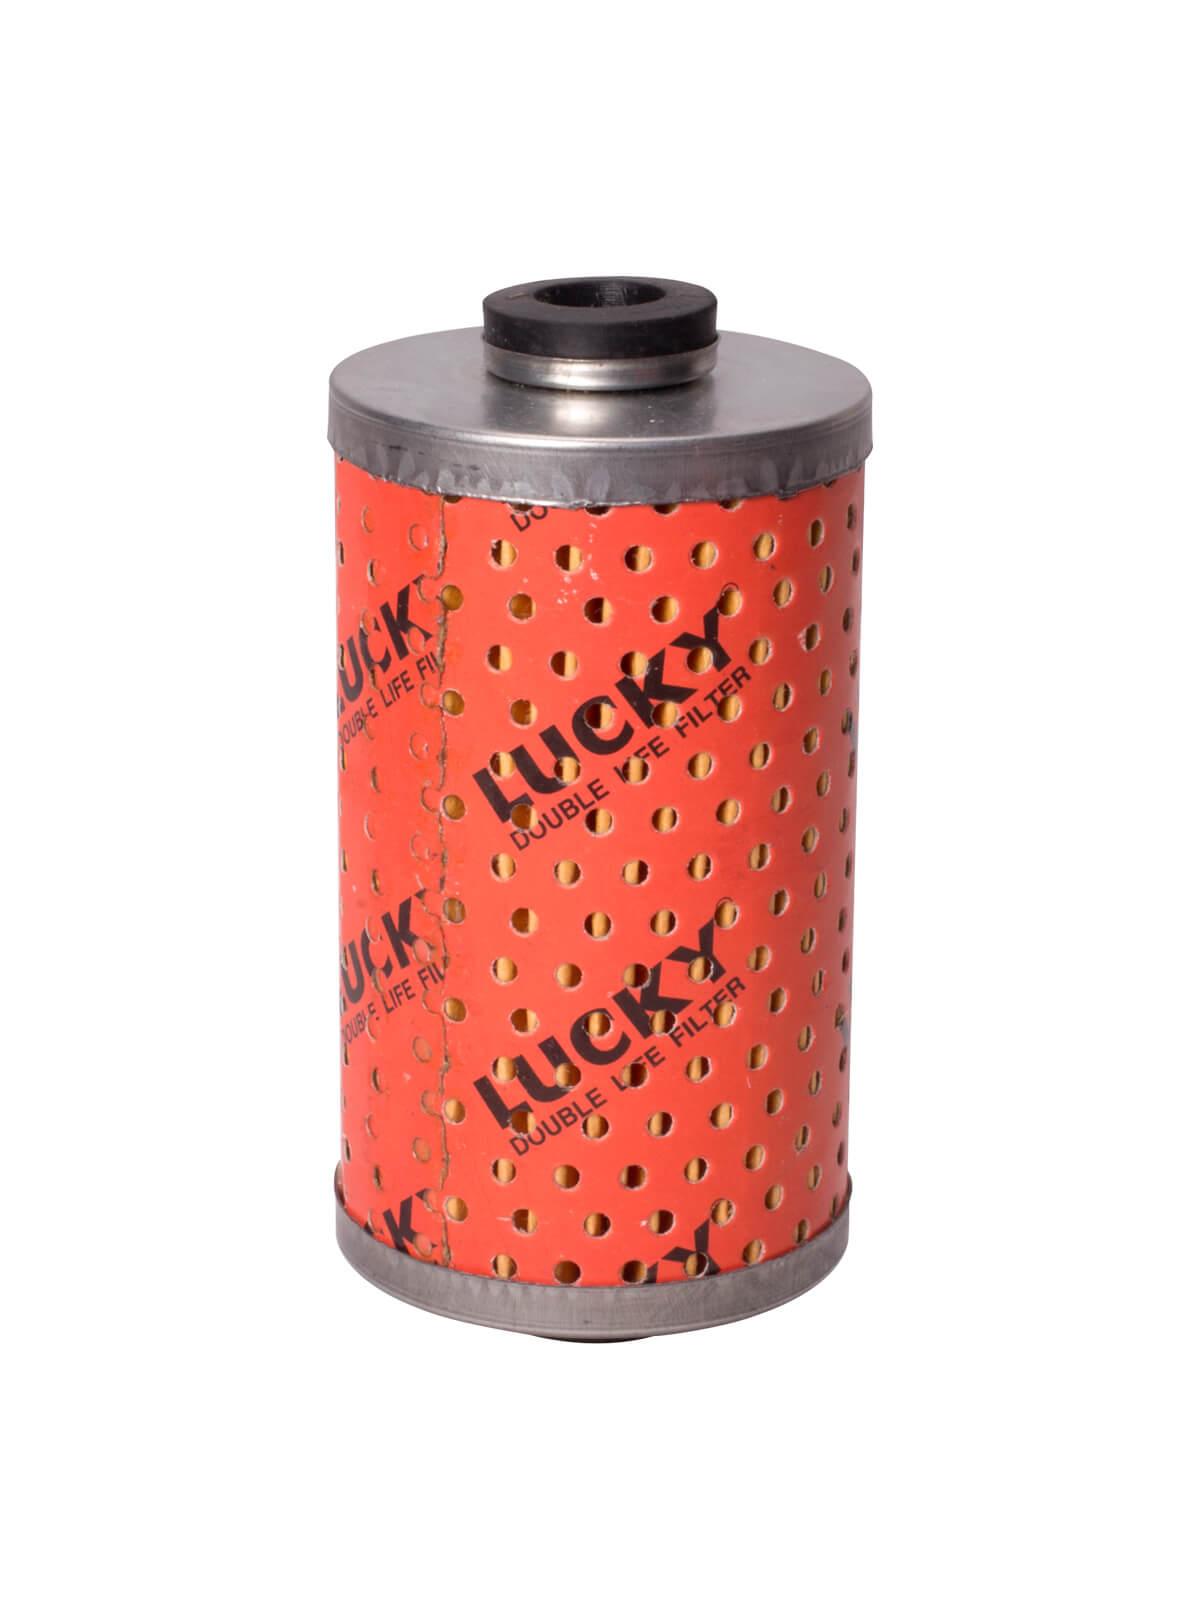 Fuel Filter (TATA-608, MAHINDRA TRACTOR)